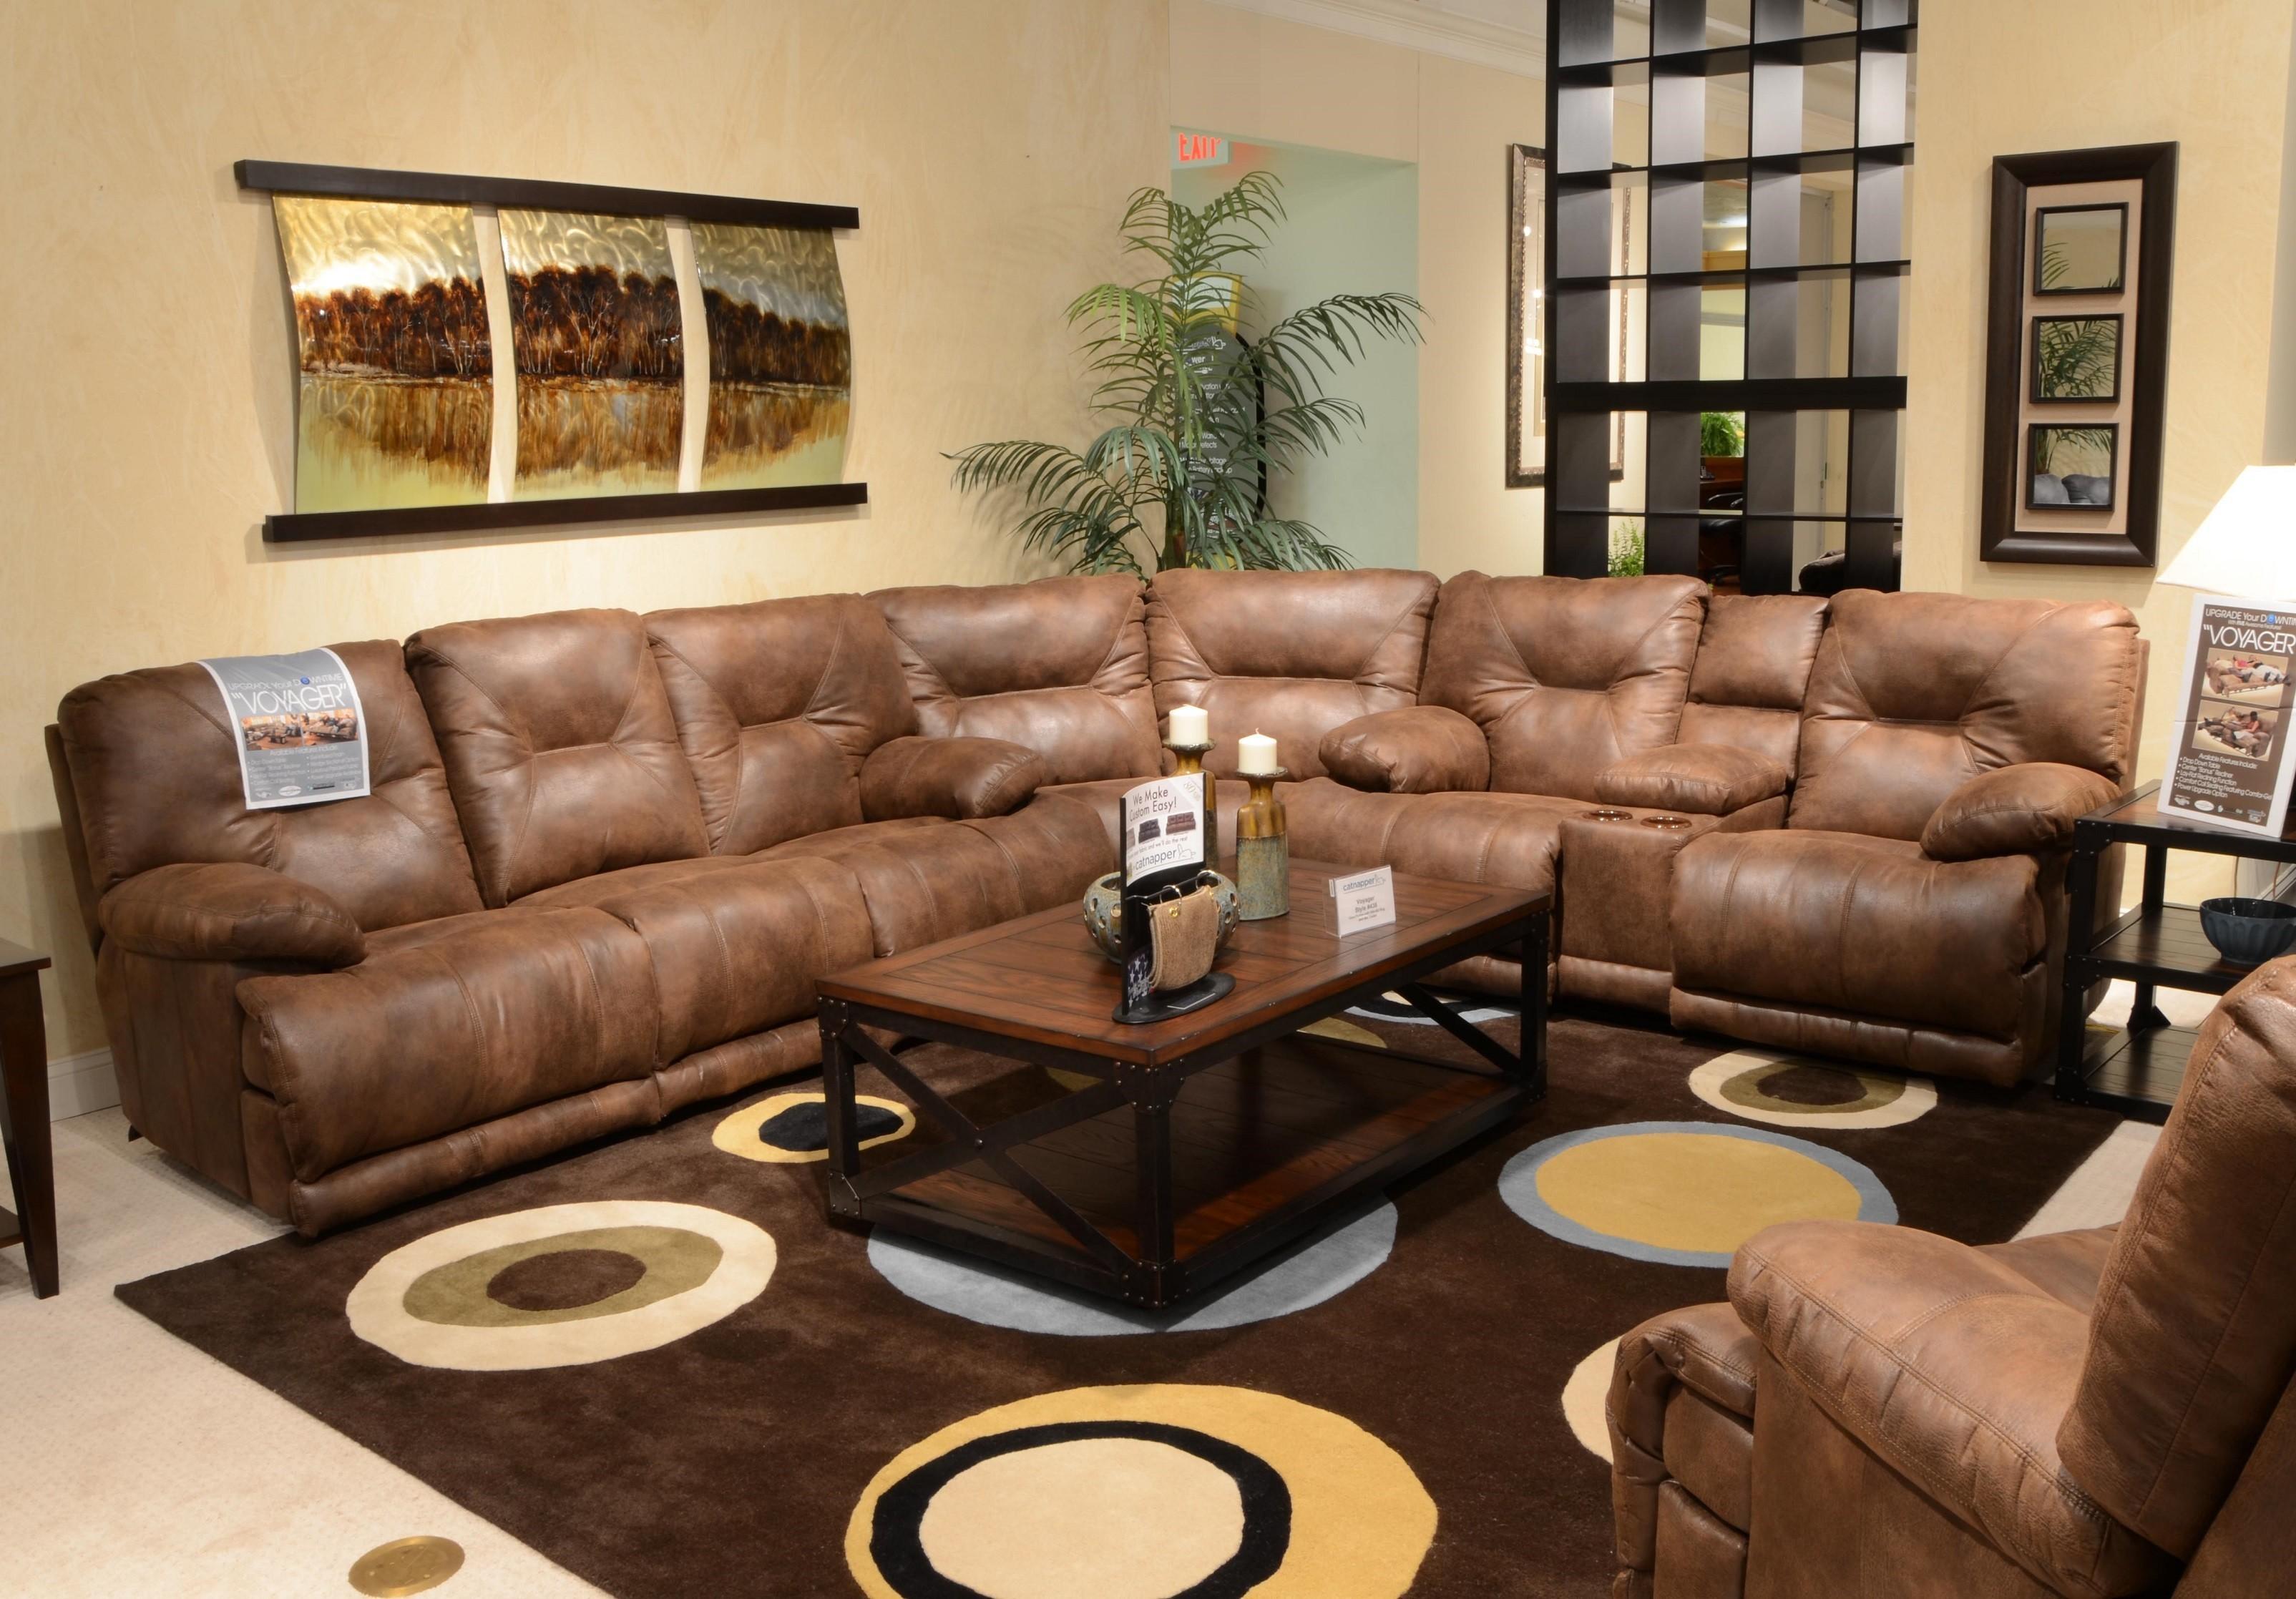 Sectional Sleeper Sofa With Recliners | Sofa Gallery | Kengire Throughout Sectional With Recliner And Sleeper (Image 12 of 20)